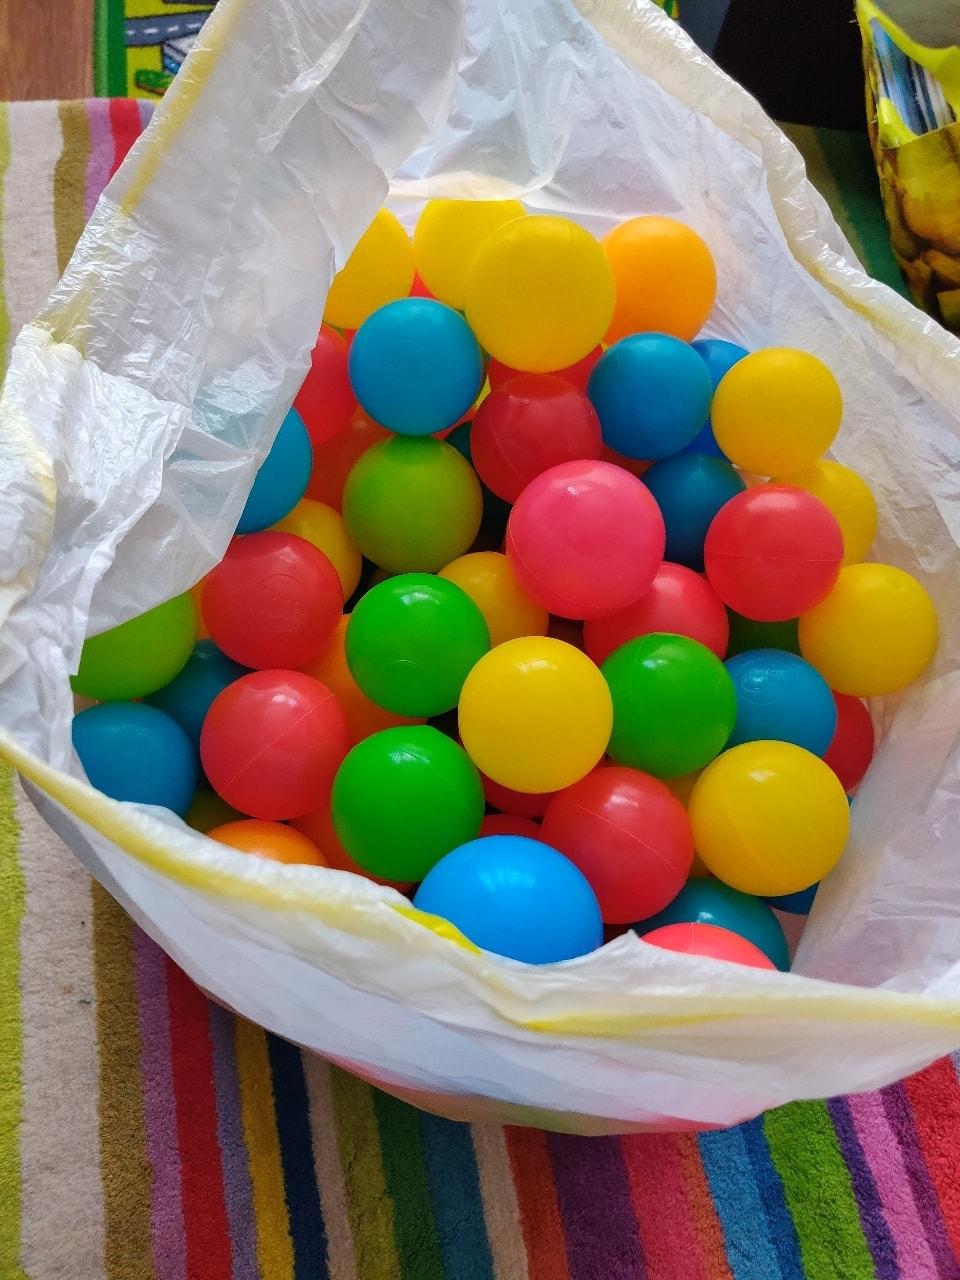 Colourful ball pit balls